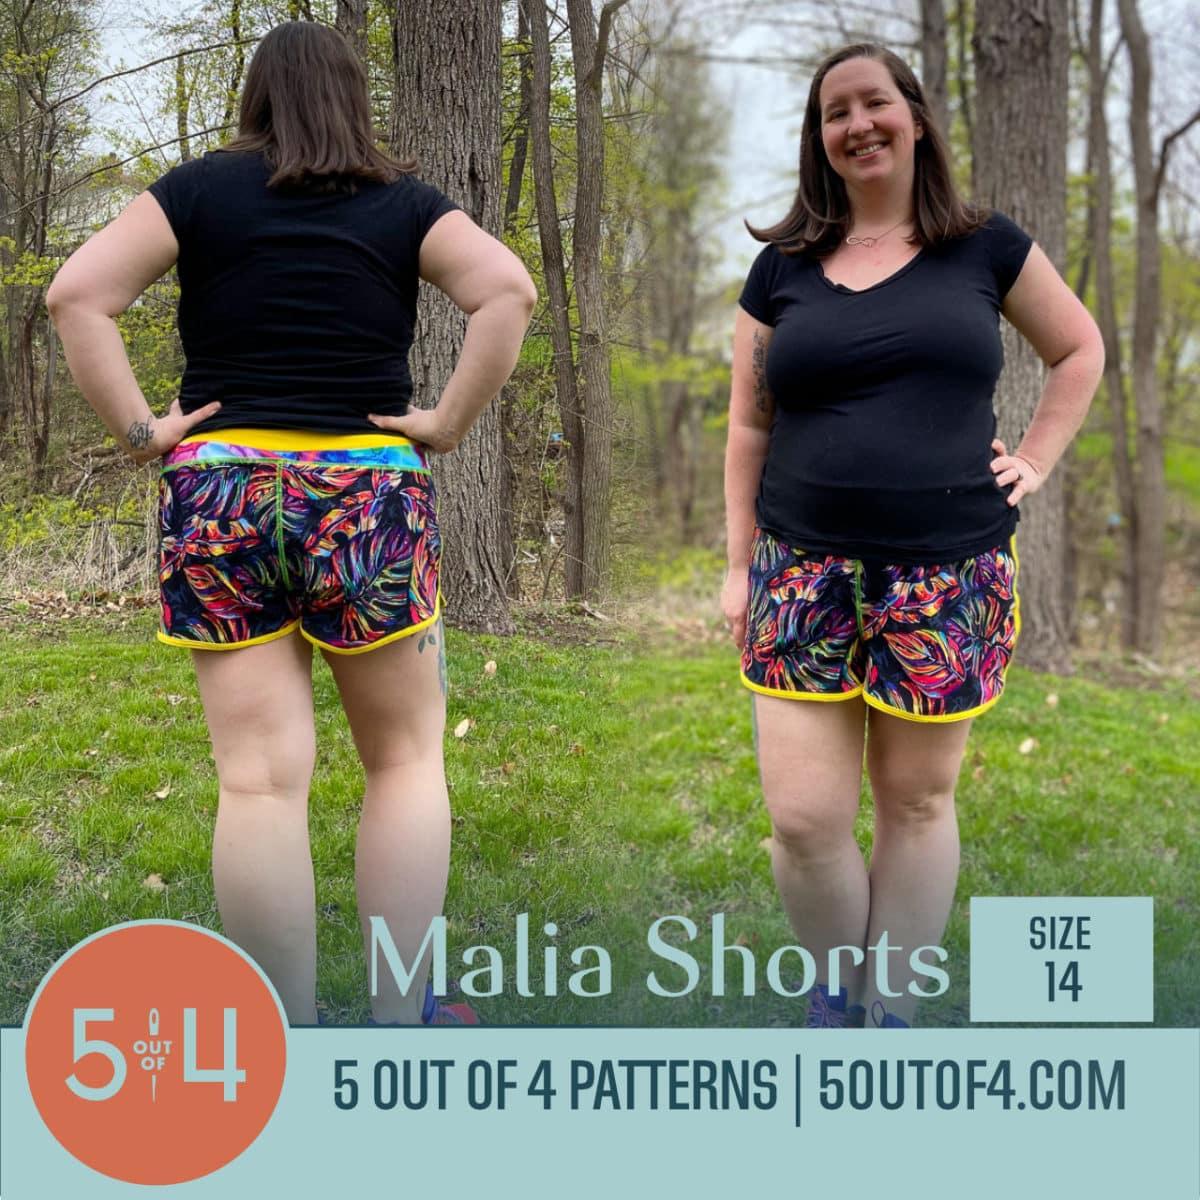 Malia Shorts Size 14